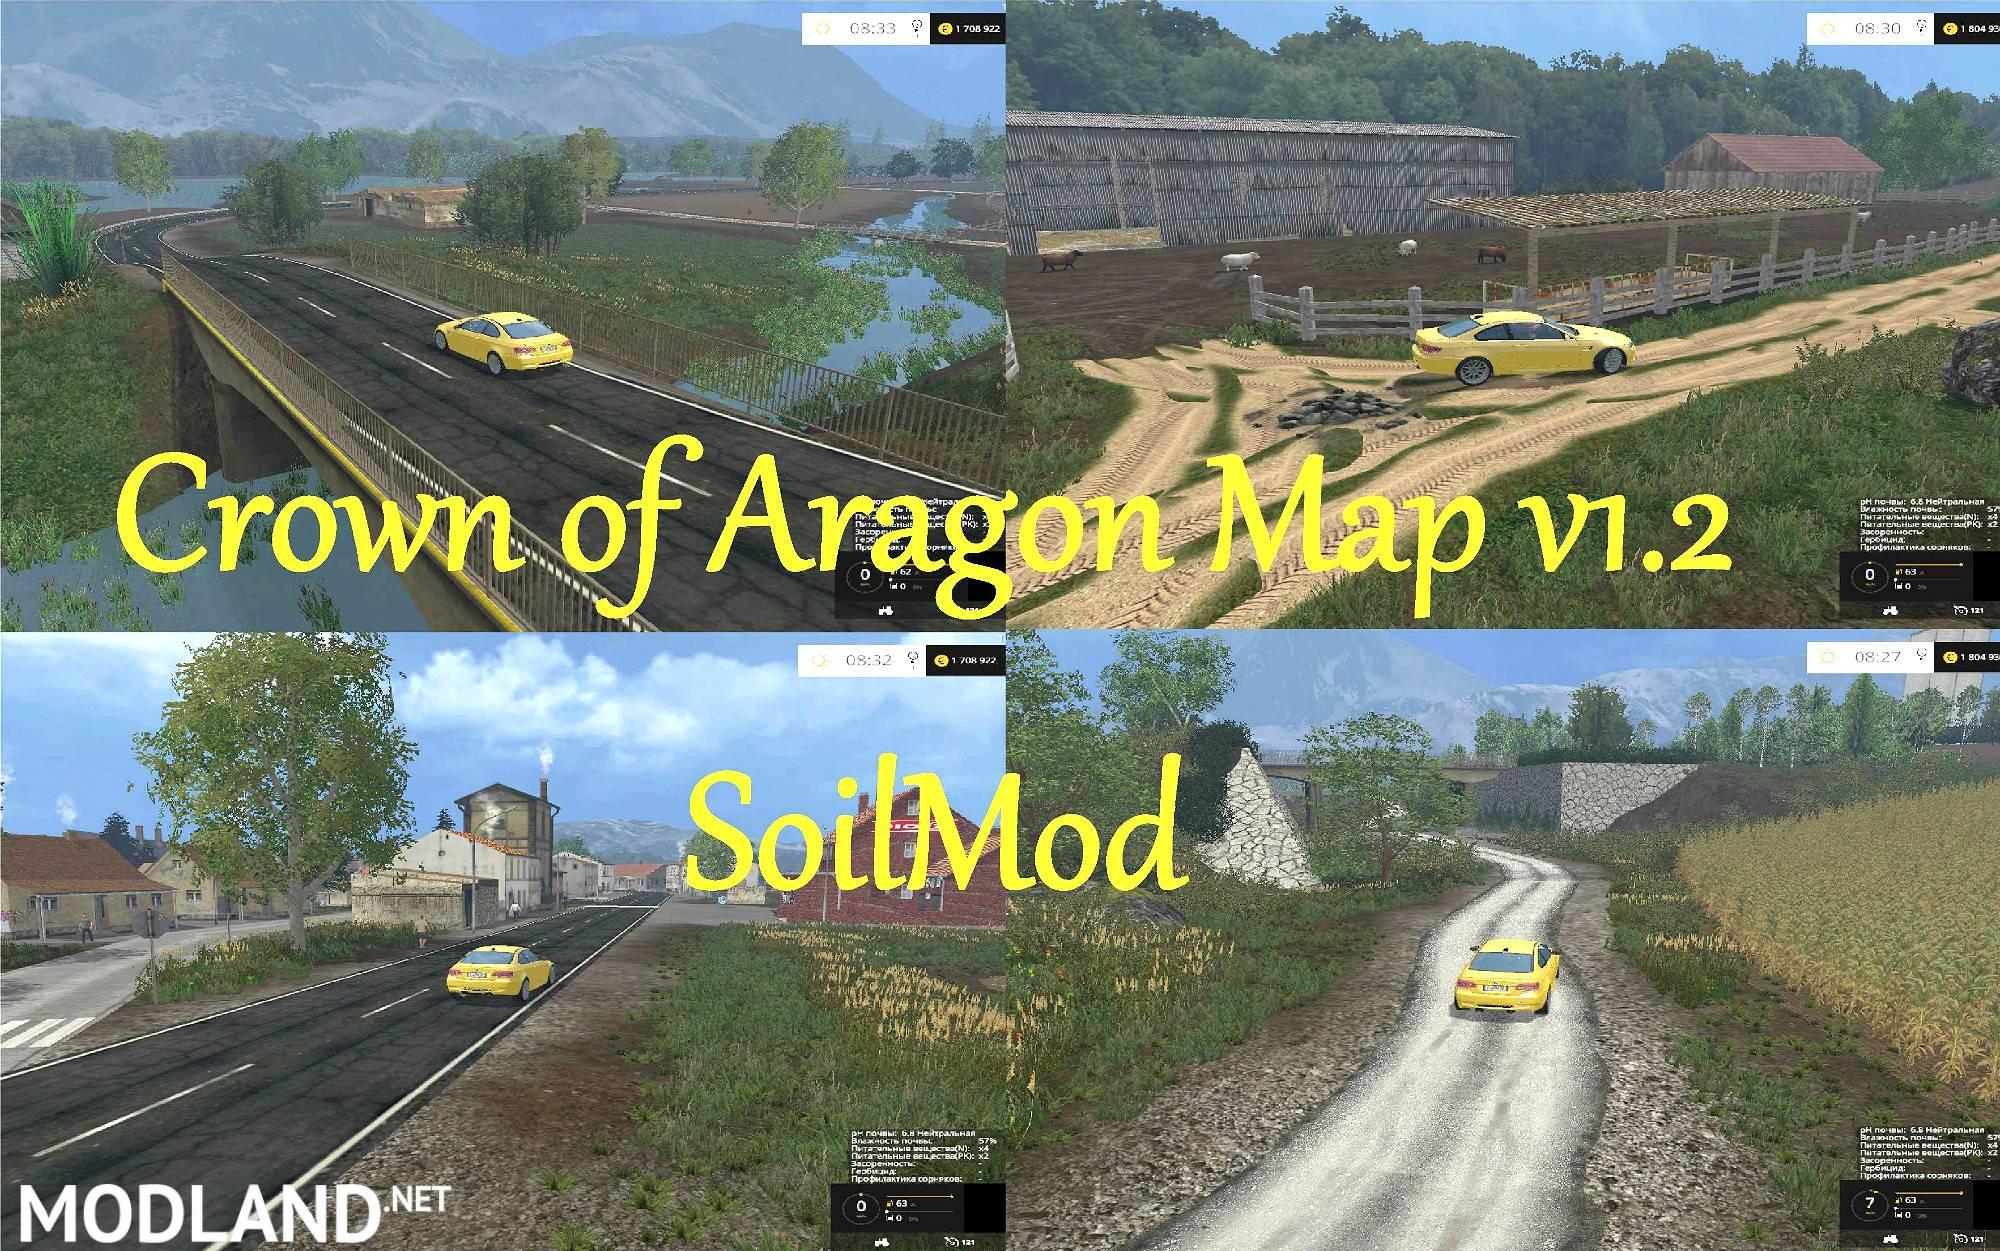 Crown of Aragon Map v 12 SoilMod